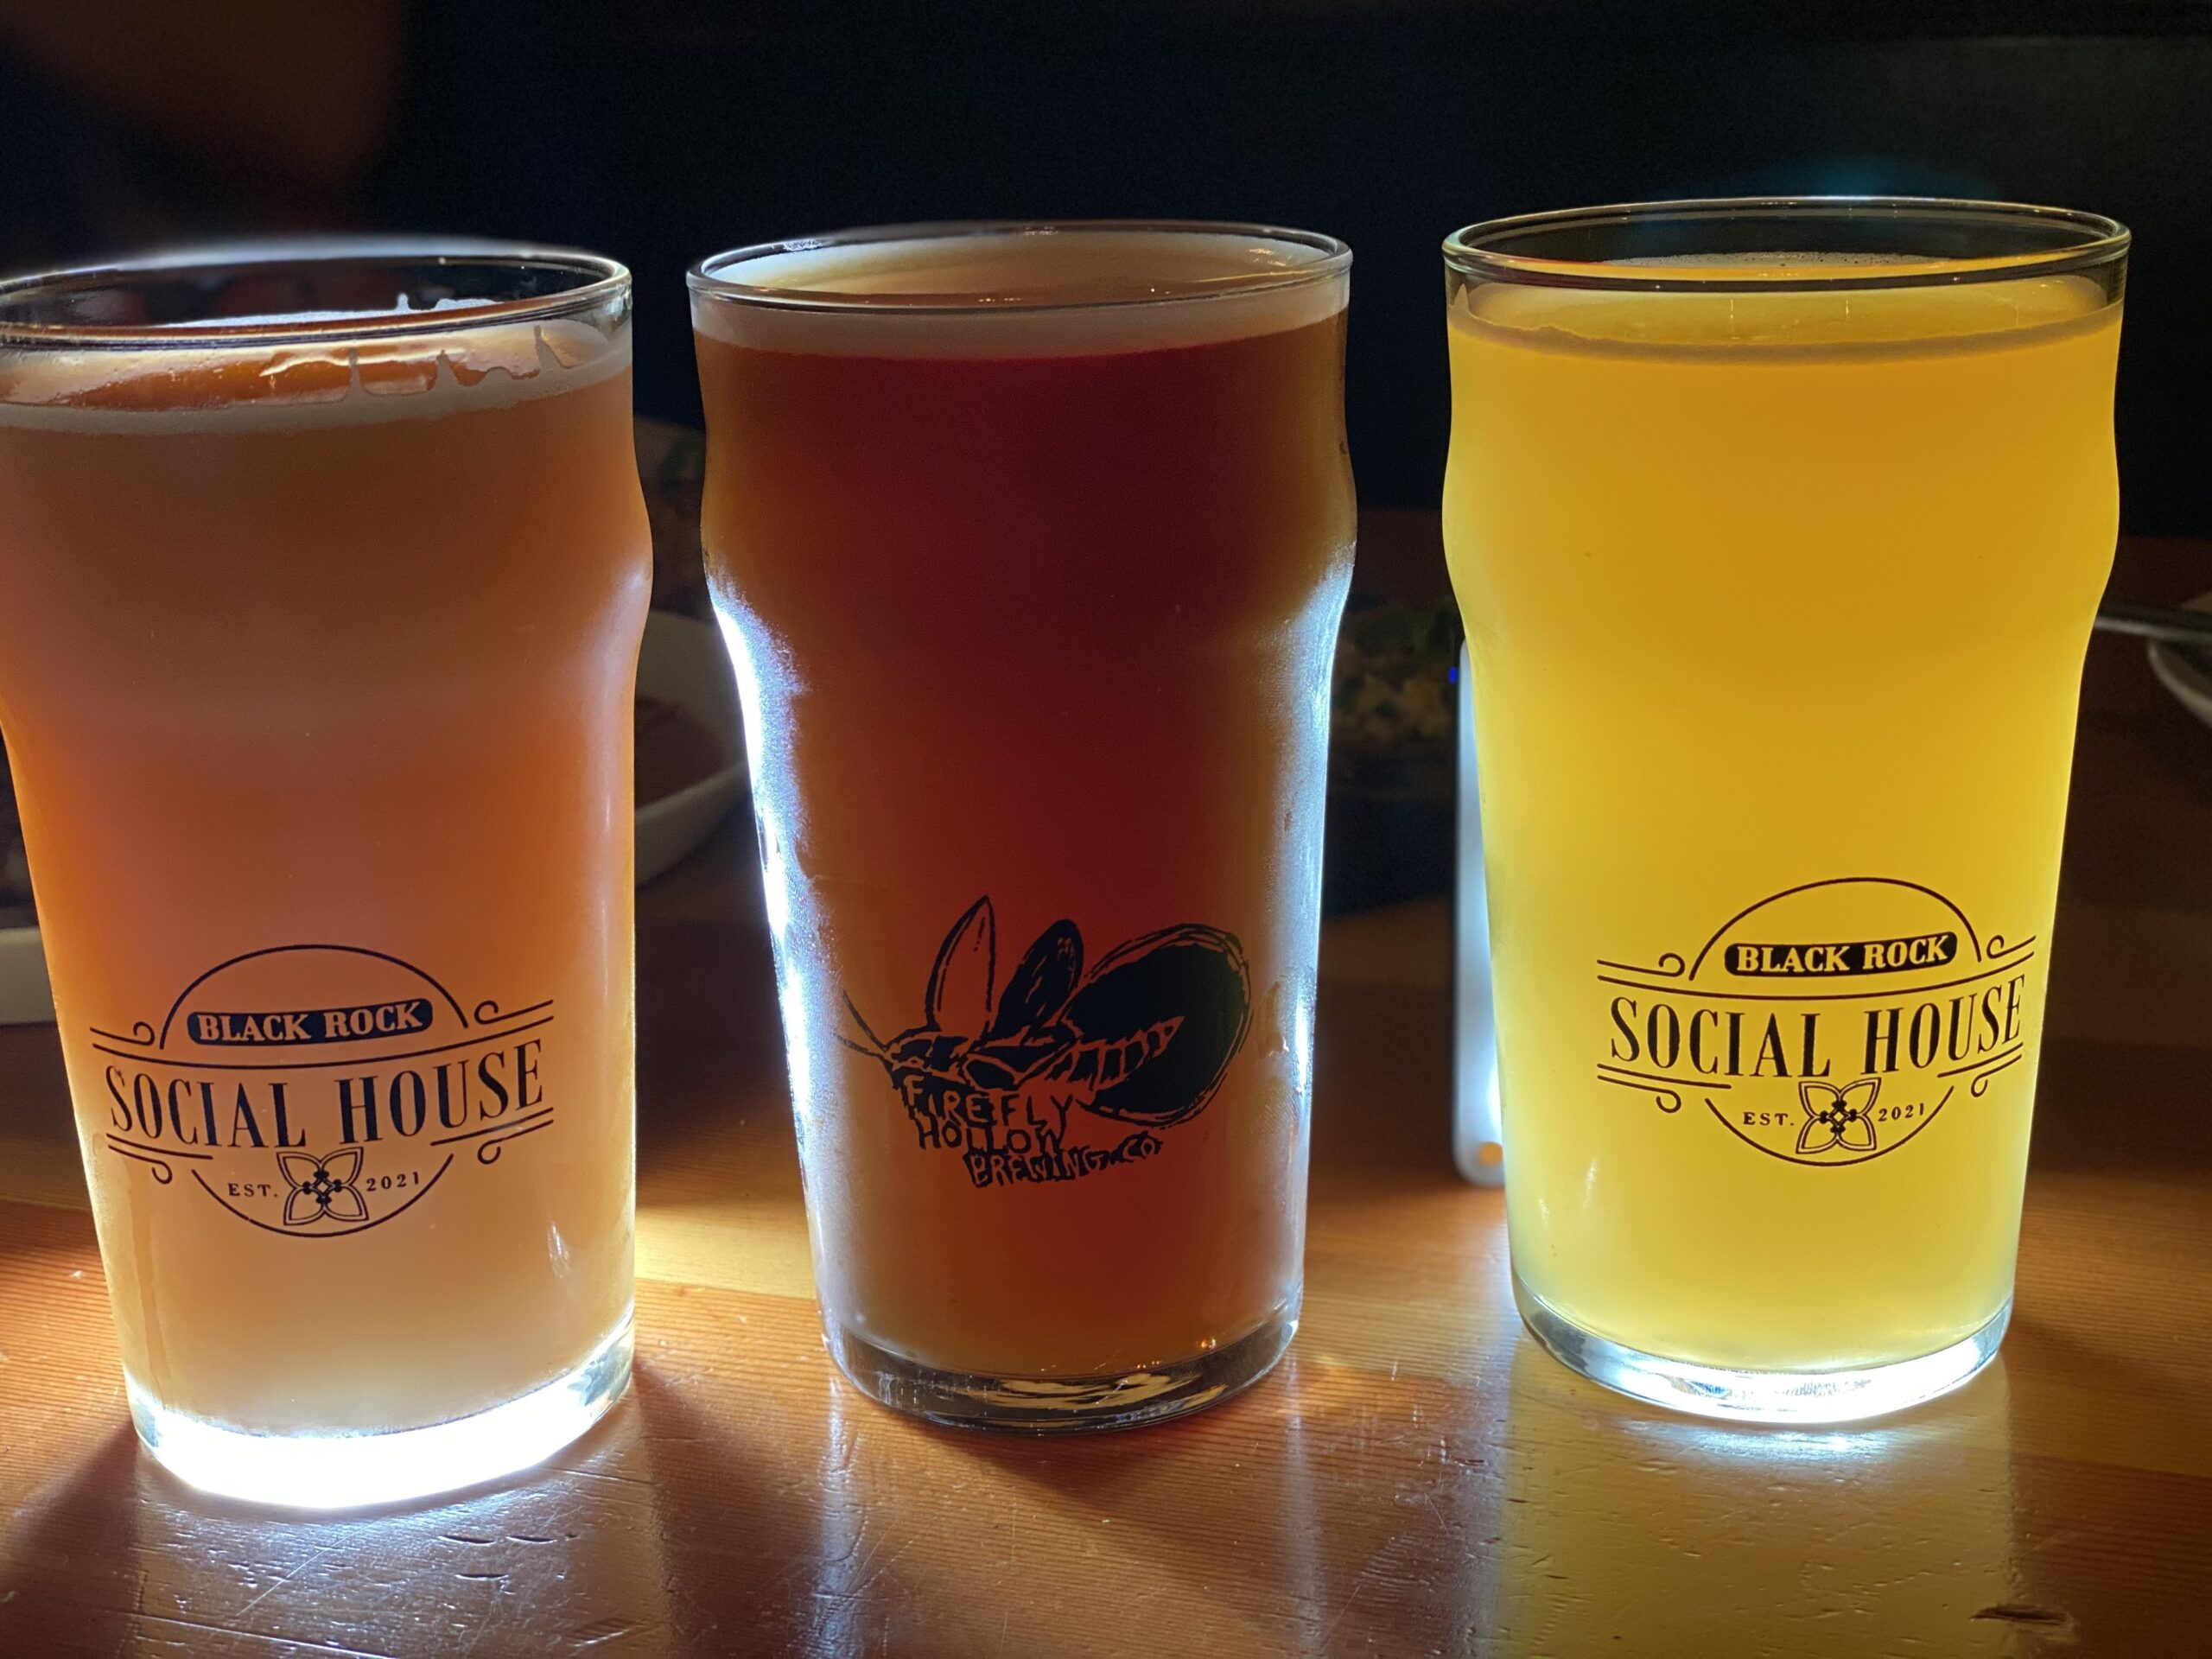 Black Rock Social House gluten-free beer